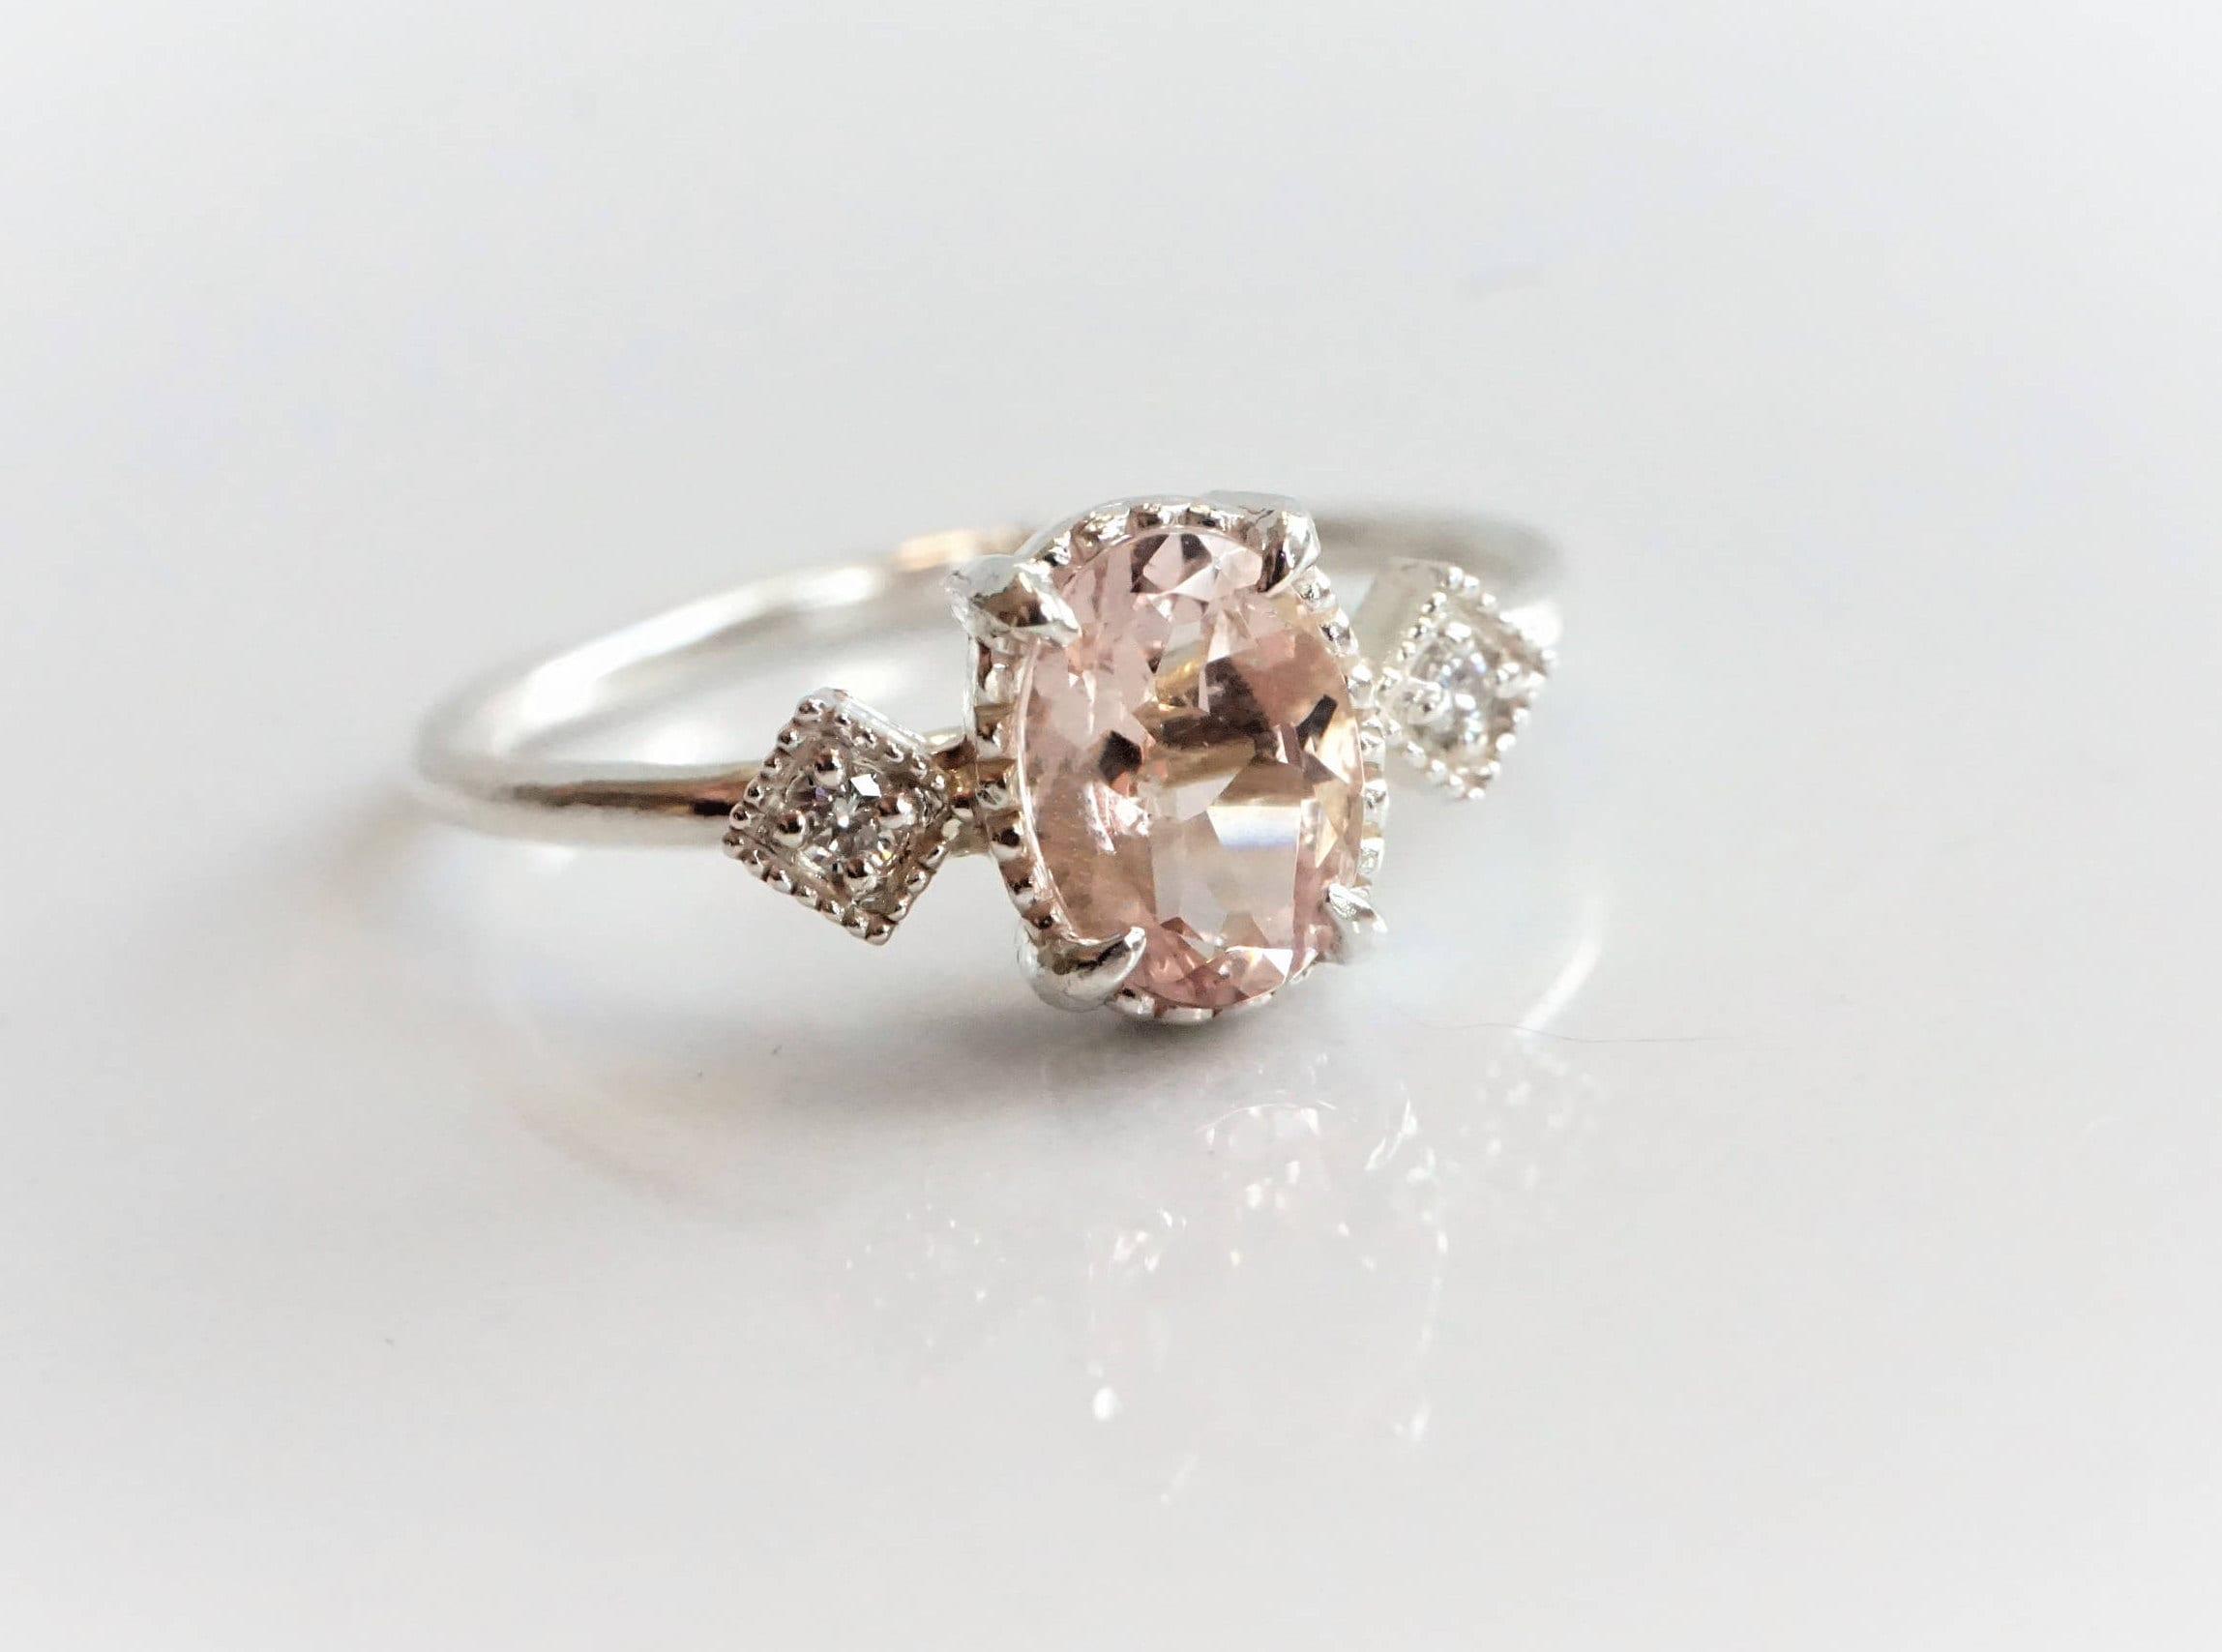 cara oval pink morganite 14k gold sterling silver